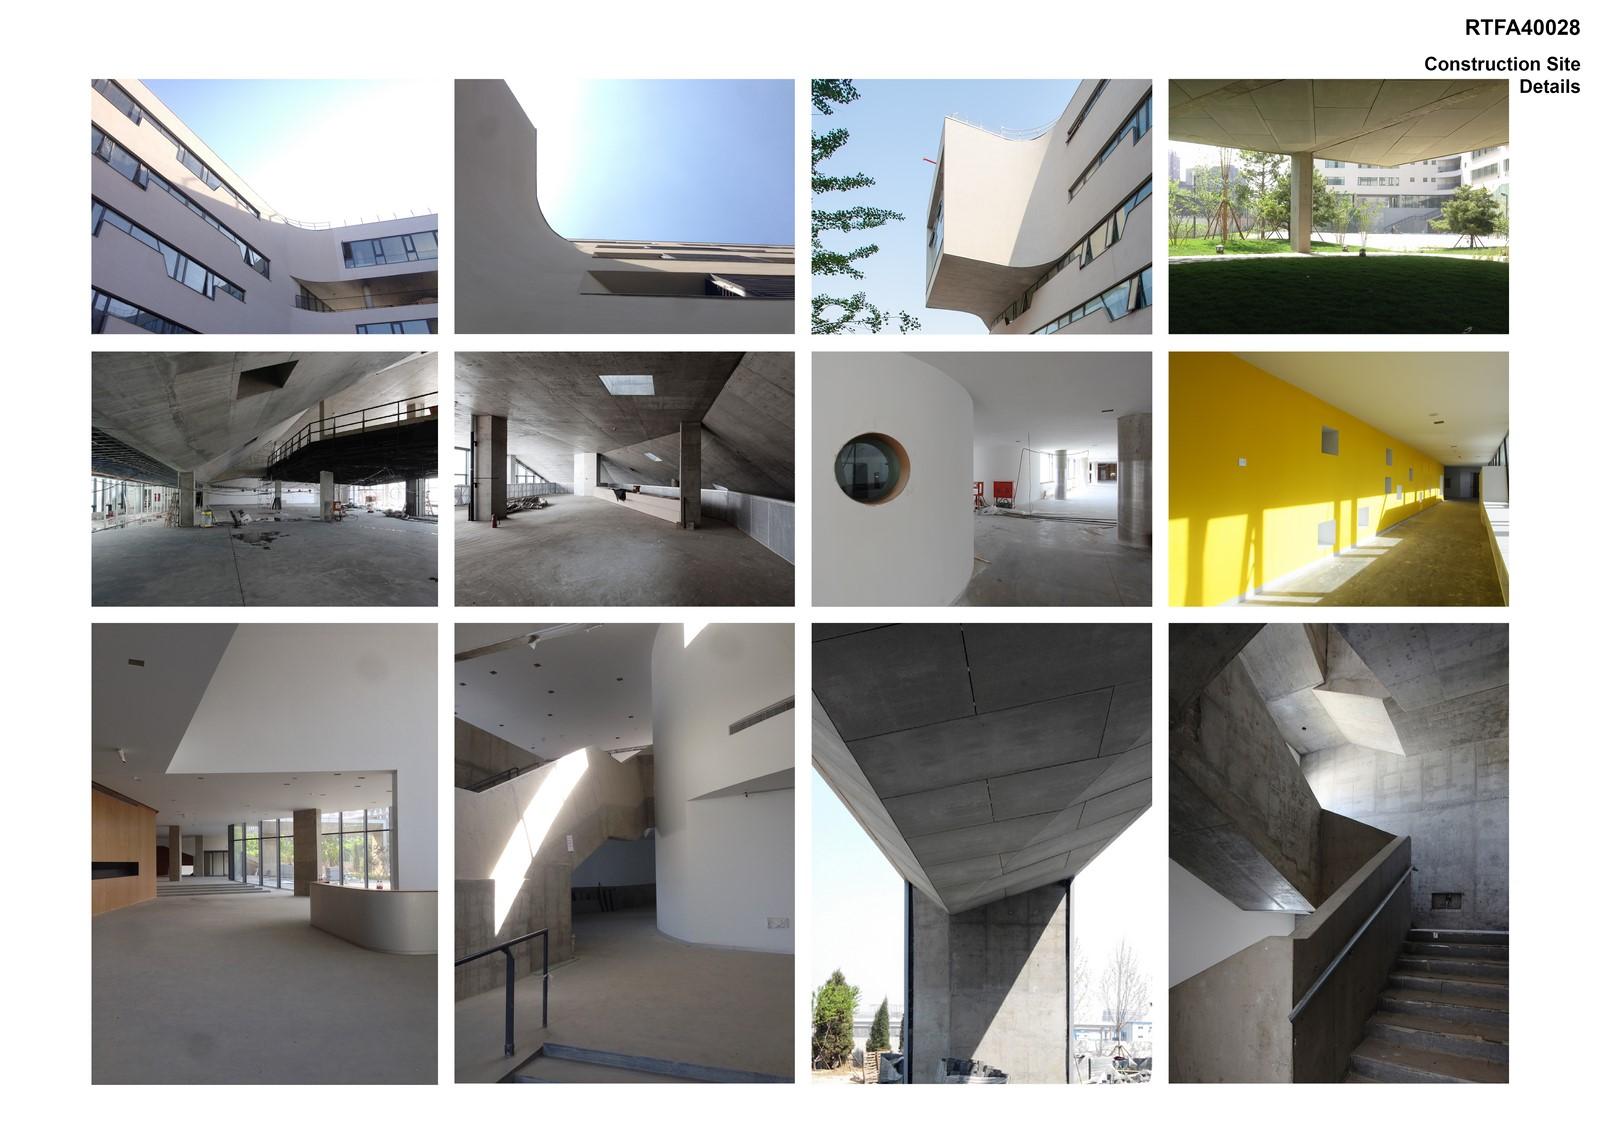 Garden School By Open Architecture - Sheet6